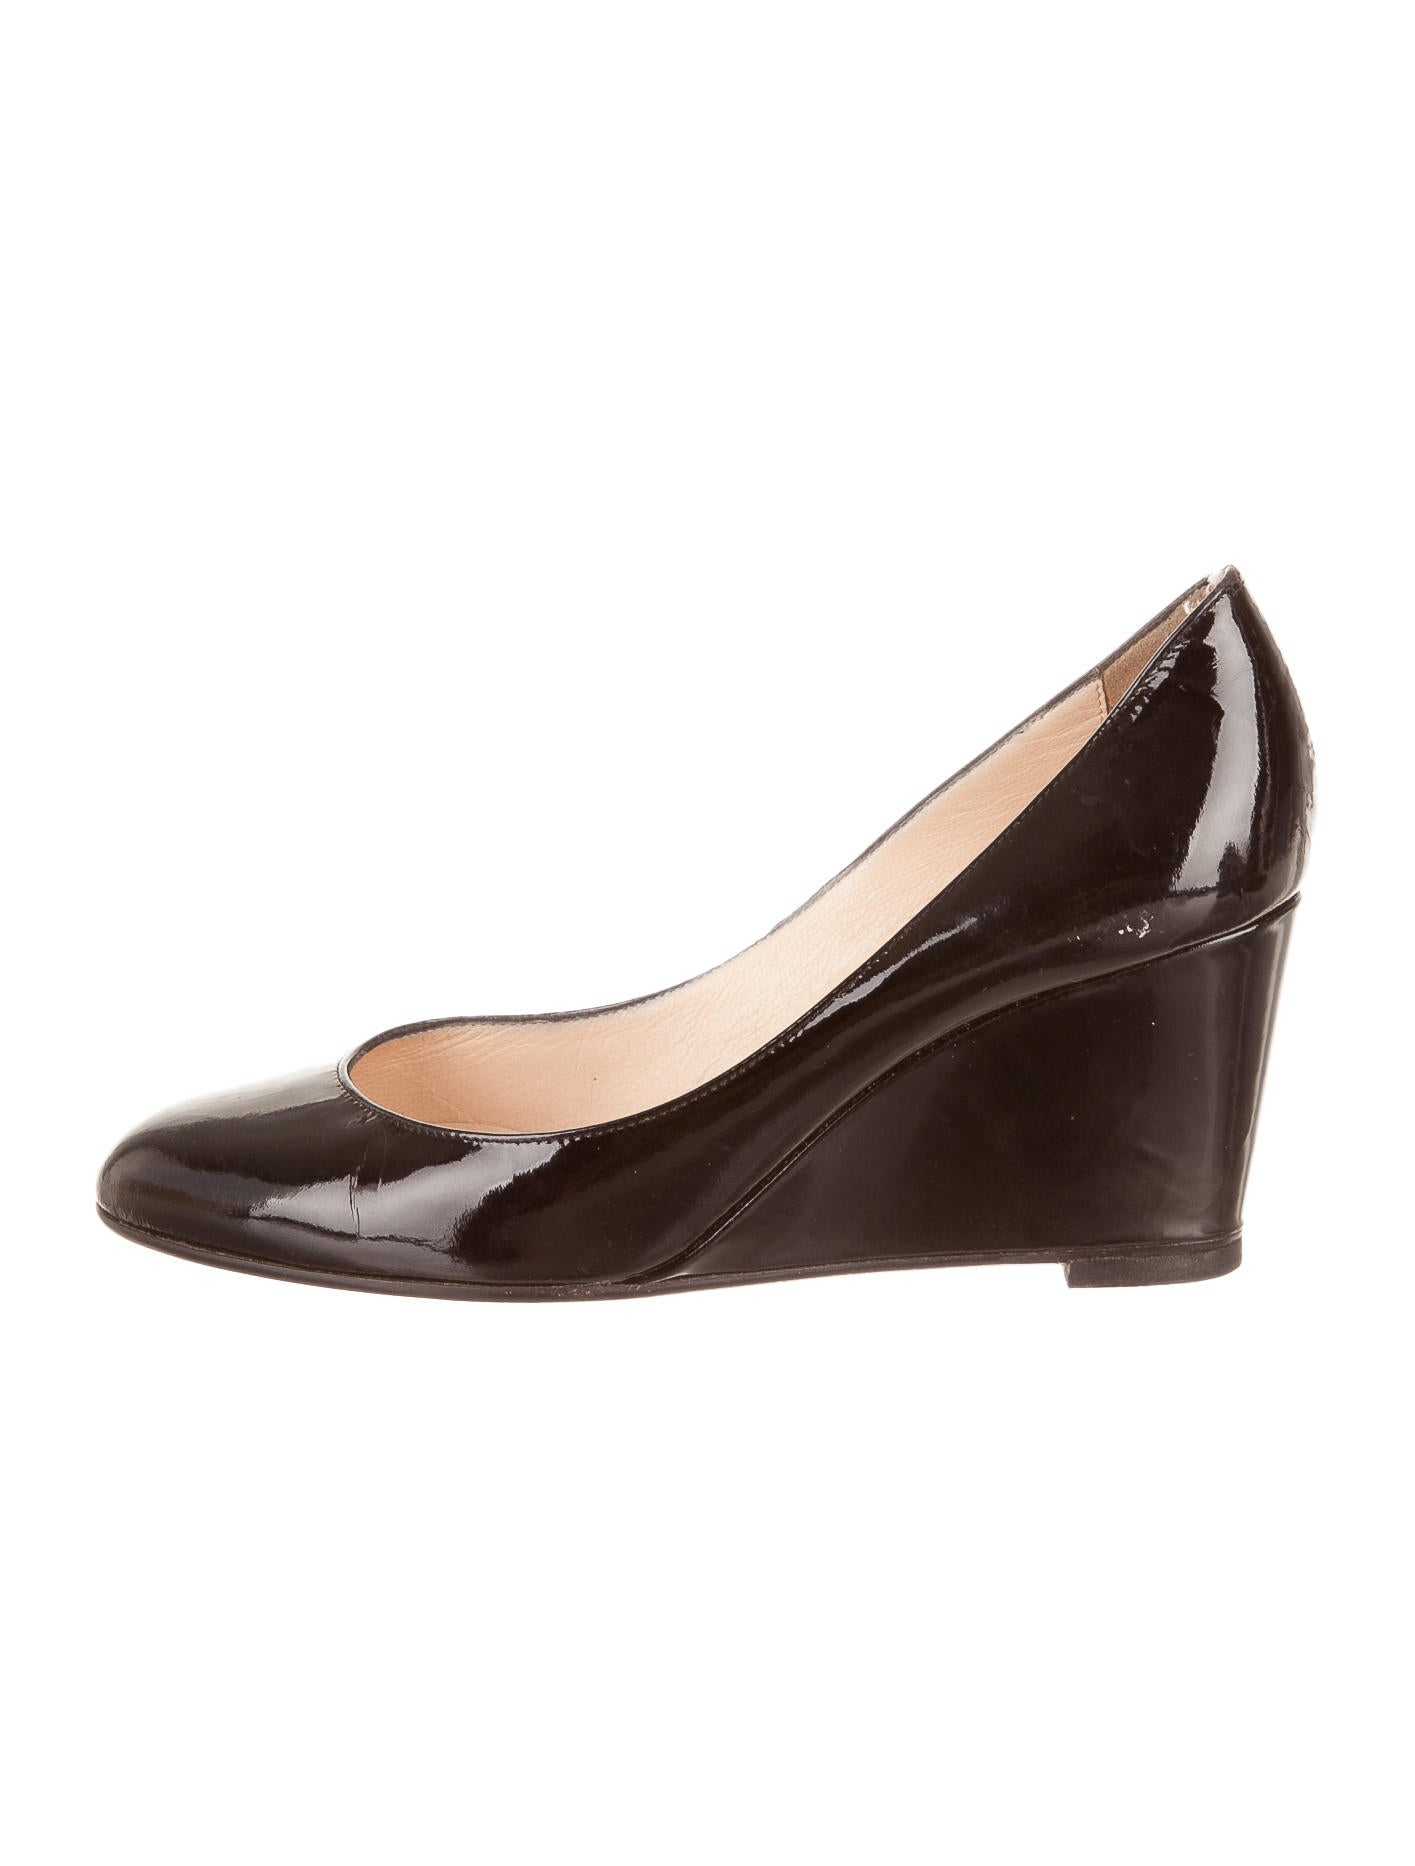 Artesur ? christian louboutin round-toe wedges Black patent ...